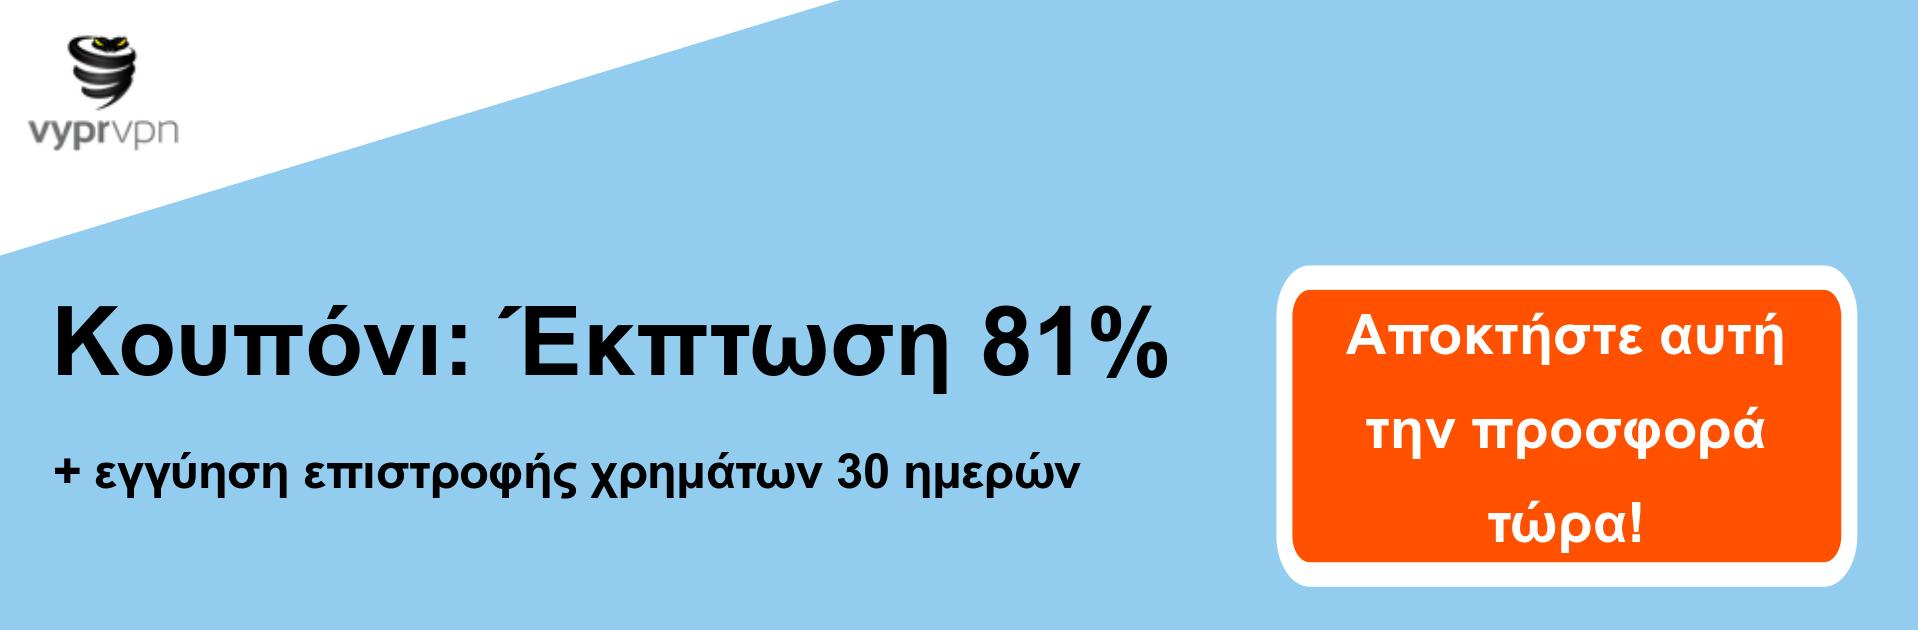 Banner κουπονιού Vypr VPN - έκπτωση 81%